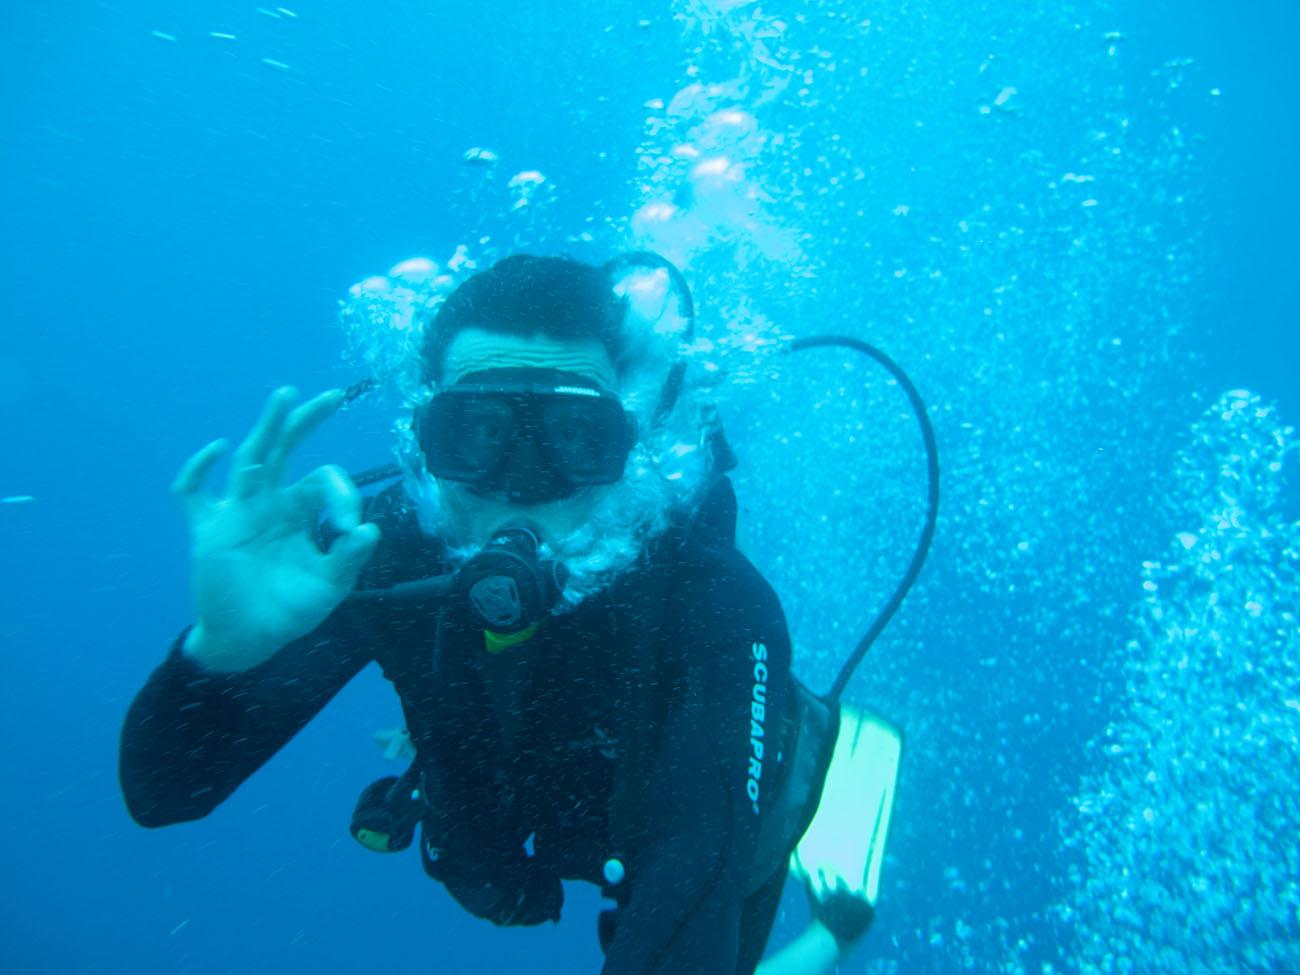 diving-044854